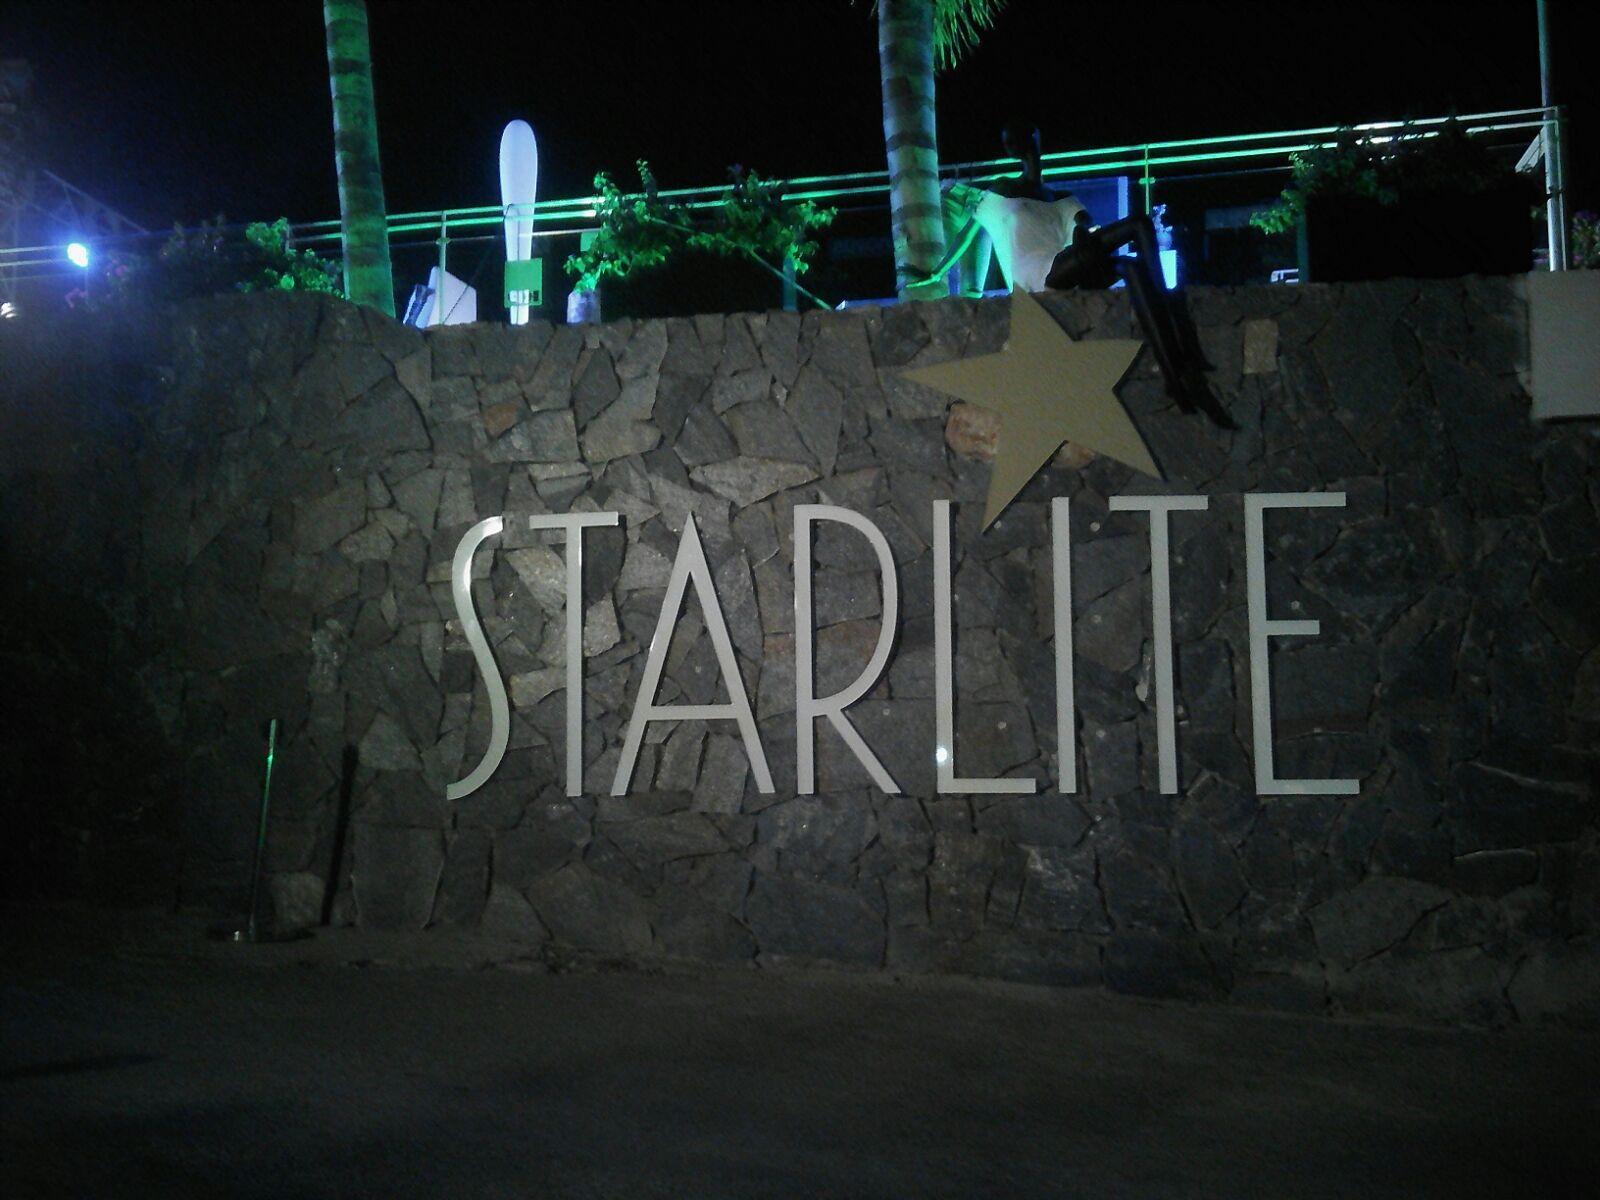 Robert Pant Starlite Marbella ConciertosyFestivales.com